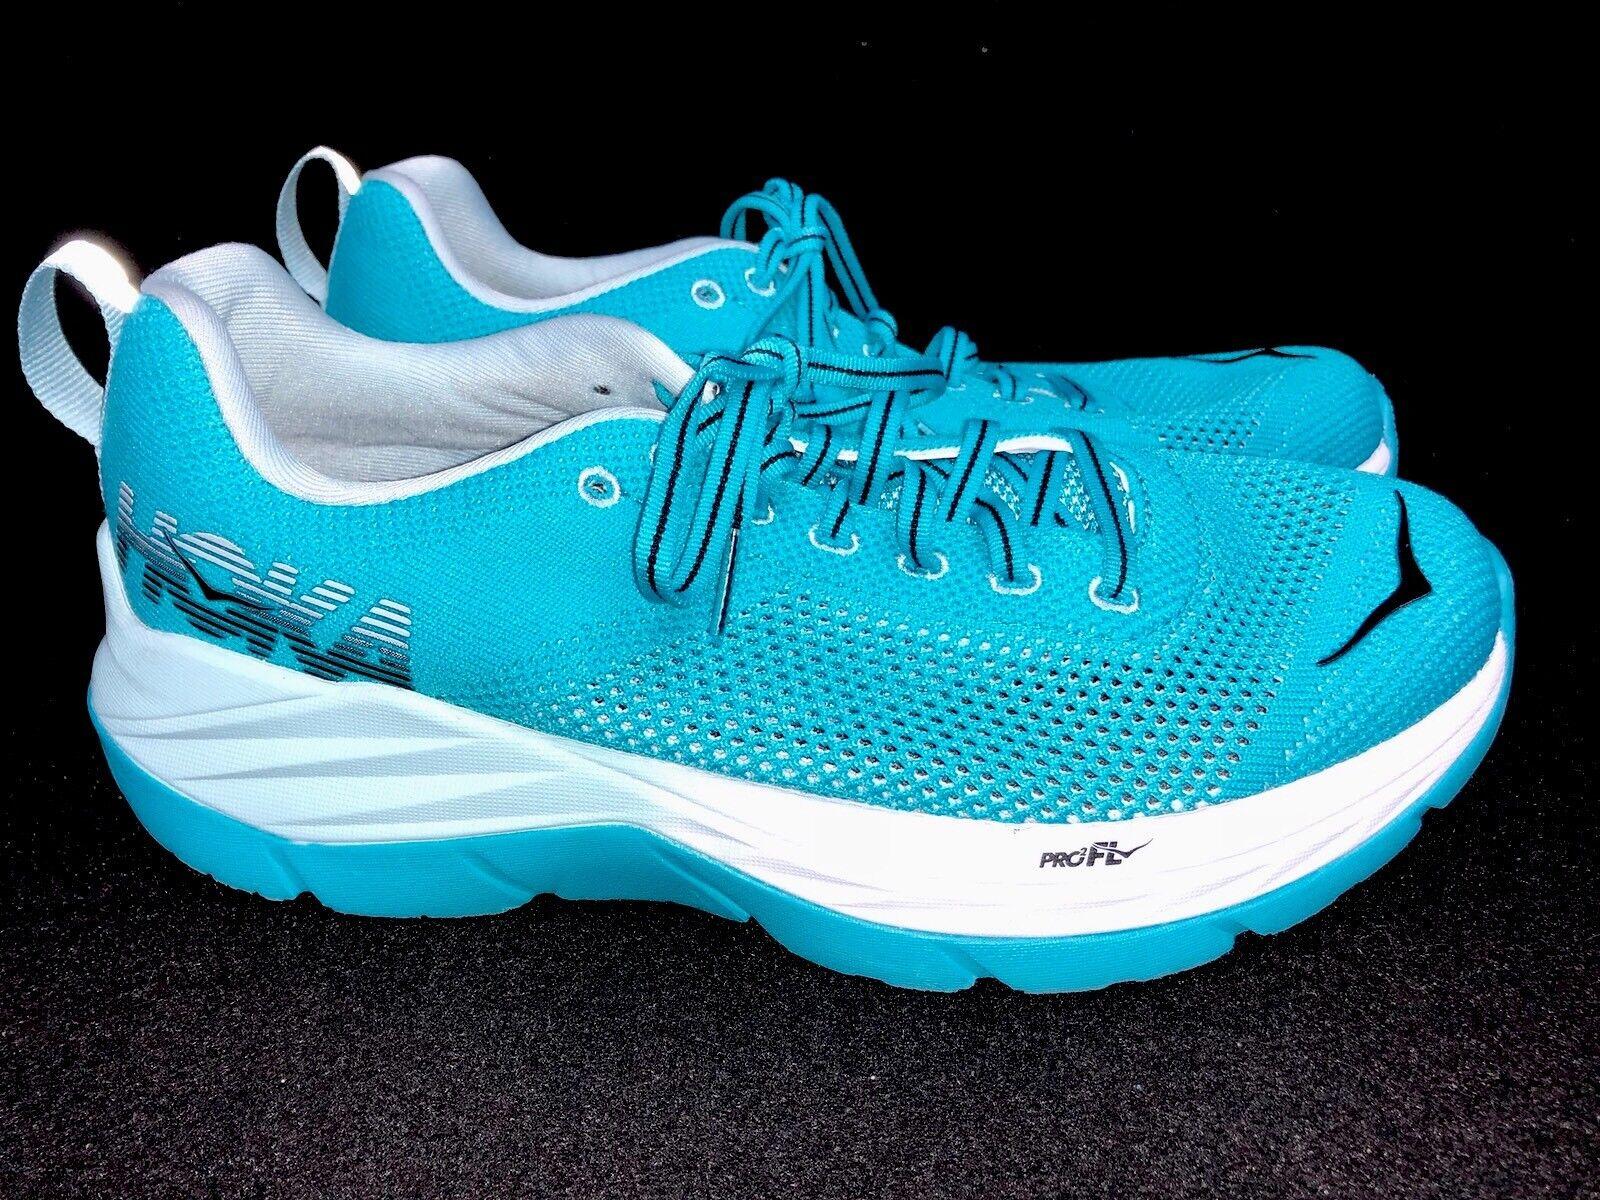 Hoka Hoka Hoka One One Mach Women's Running Tennis shoes blueebird   White Athletic 1e34d8